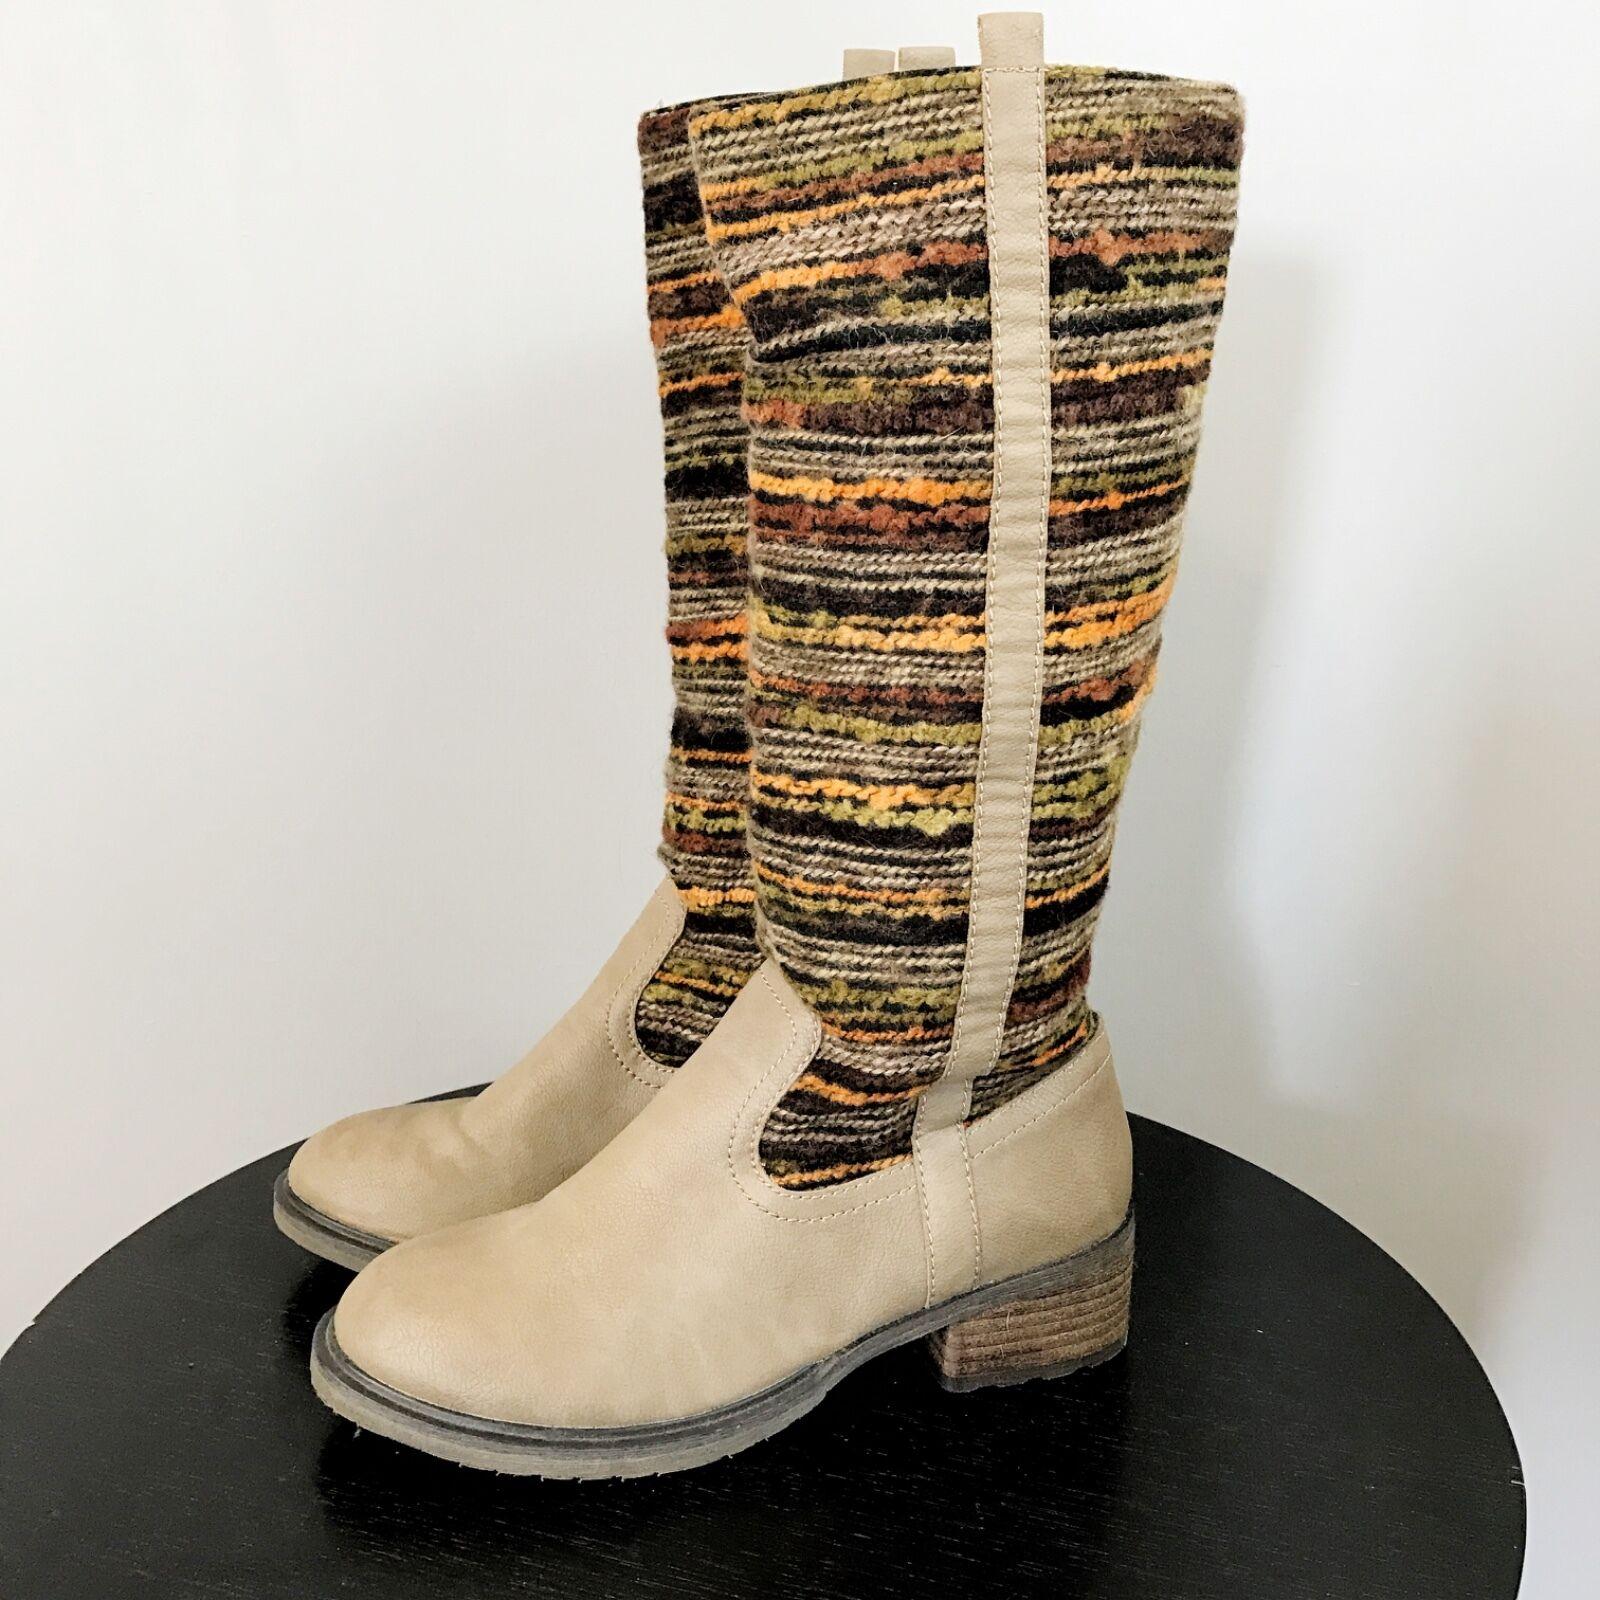 SBICCA Boho Hippie Boots SZ 6.5 Tapestry Shaft Pull On Festival Gypsy Grey